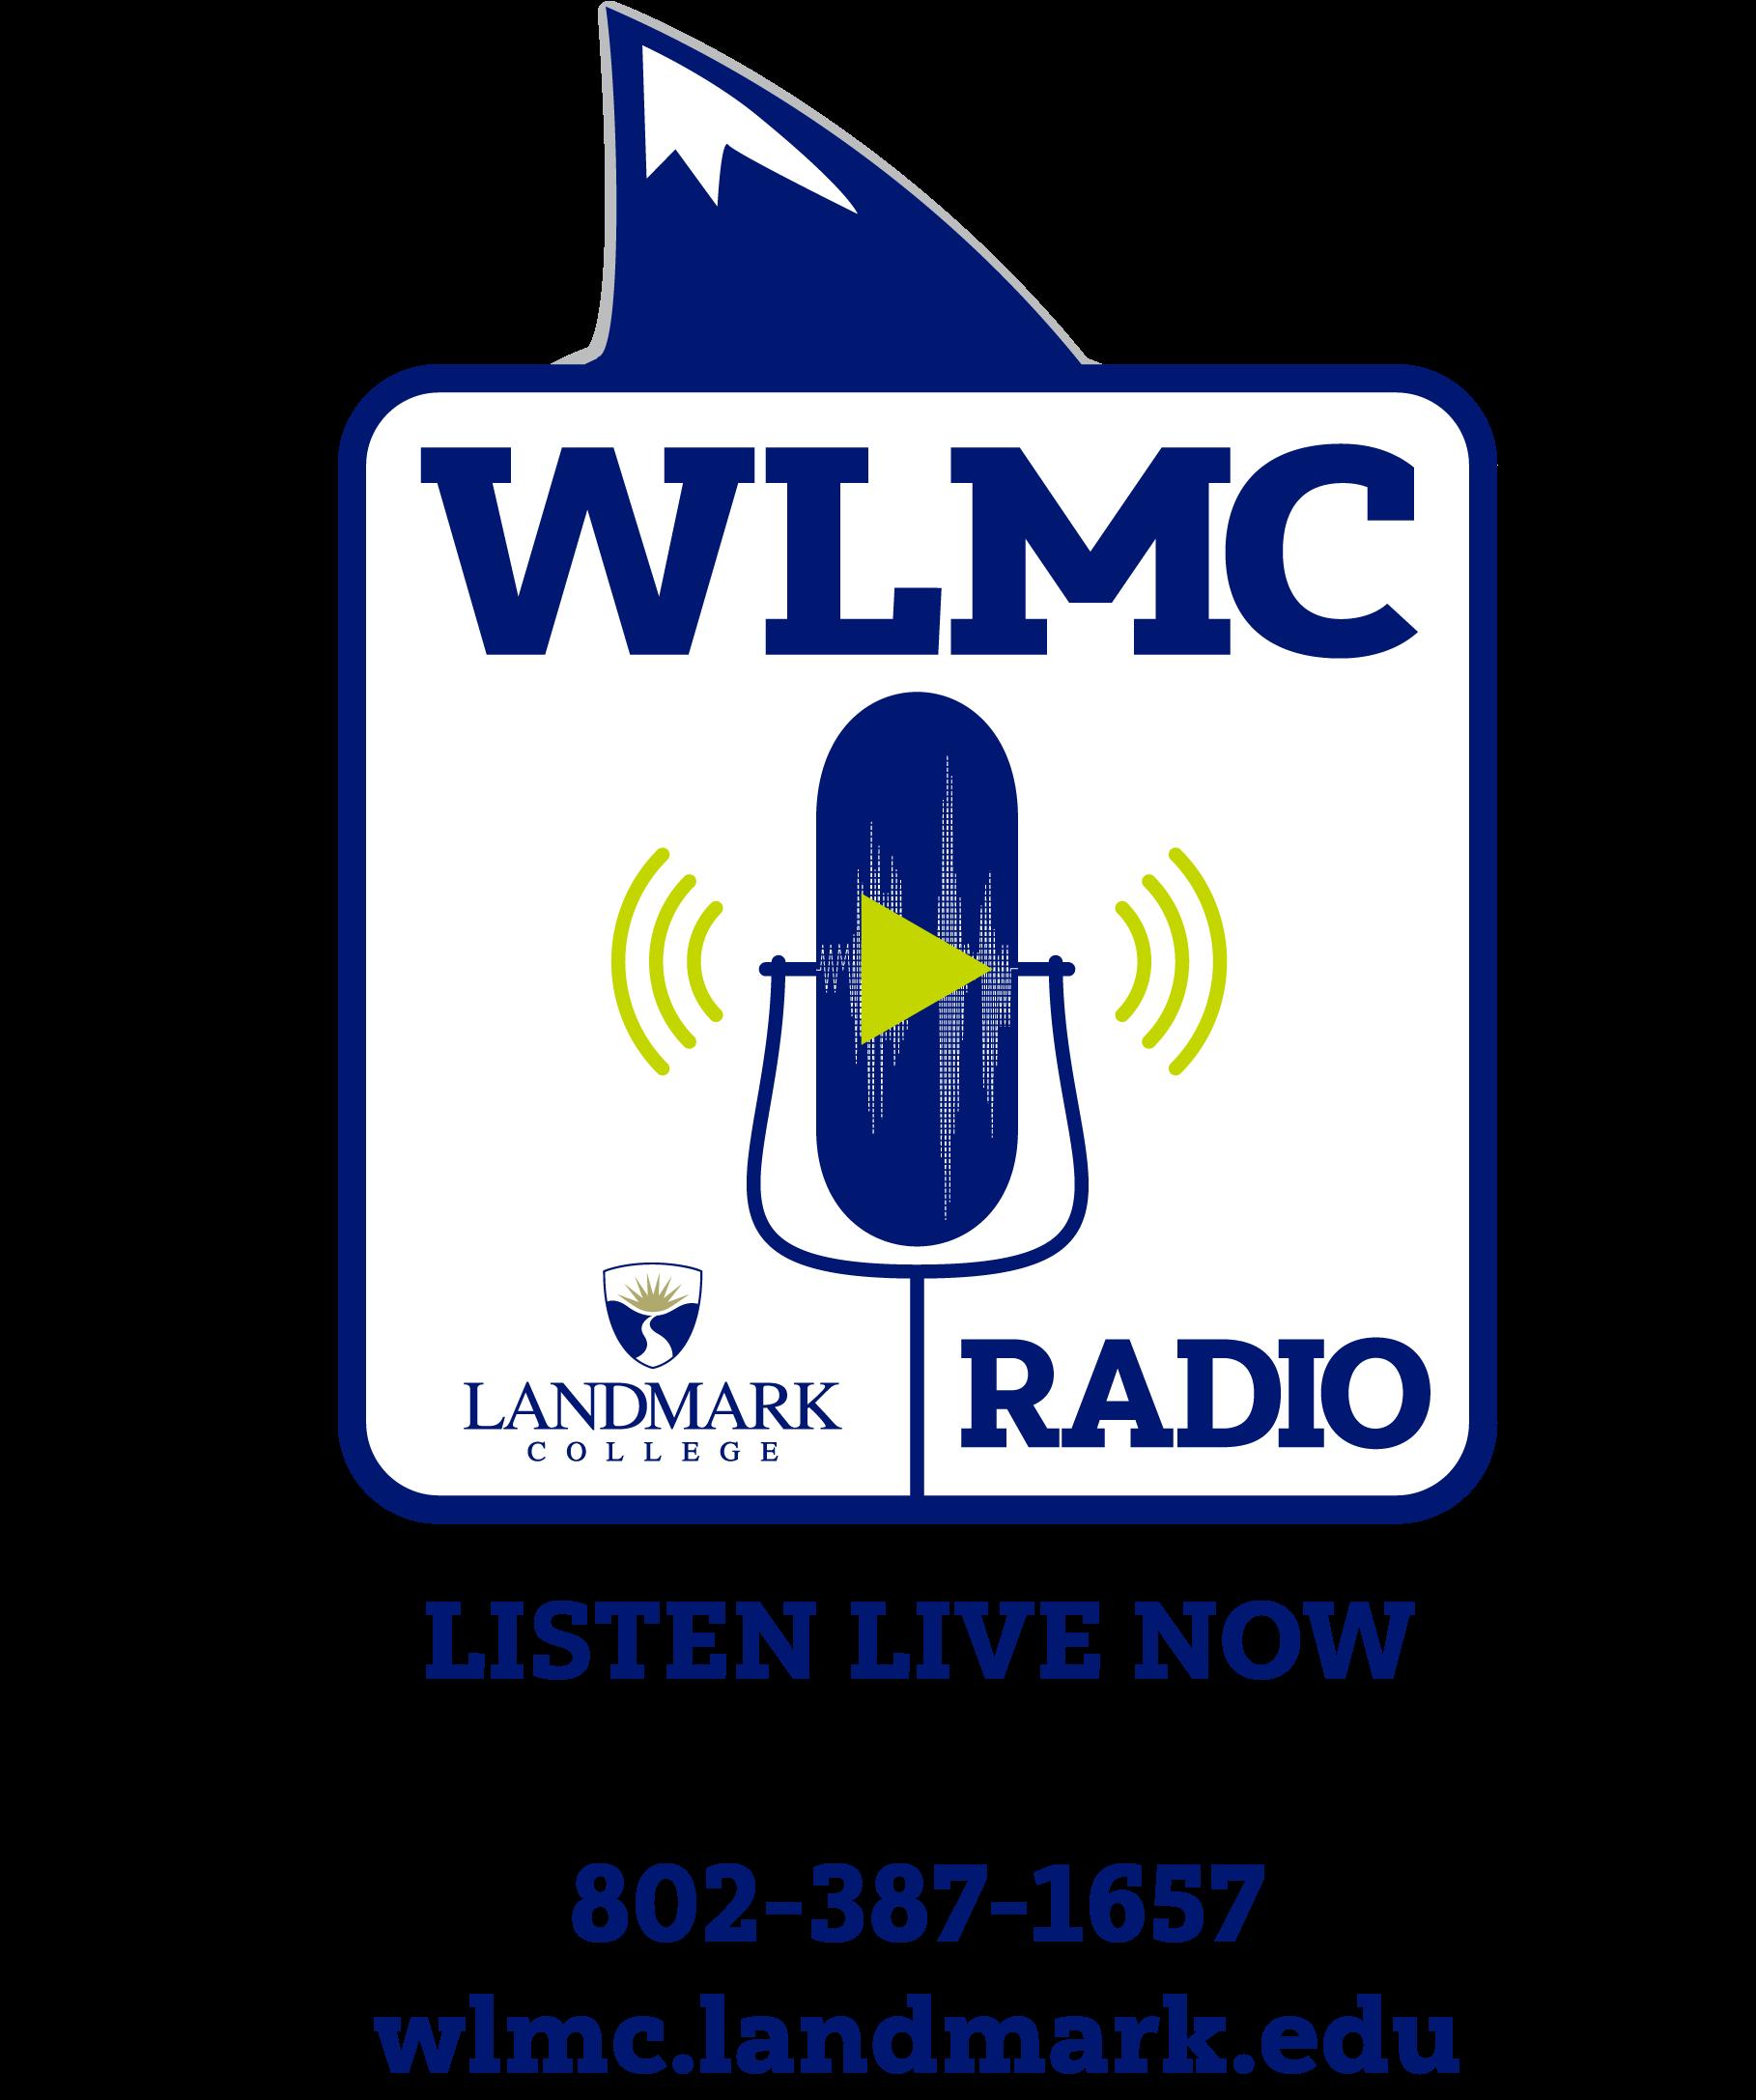 WLMC Radio at Landmark College logo